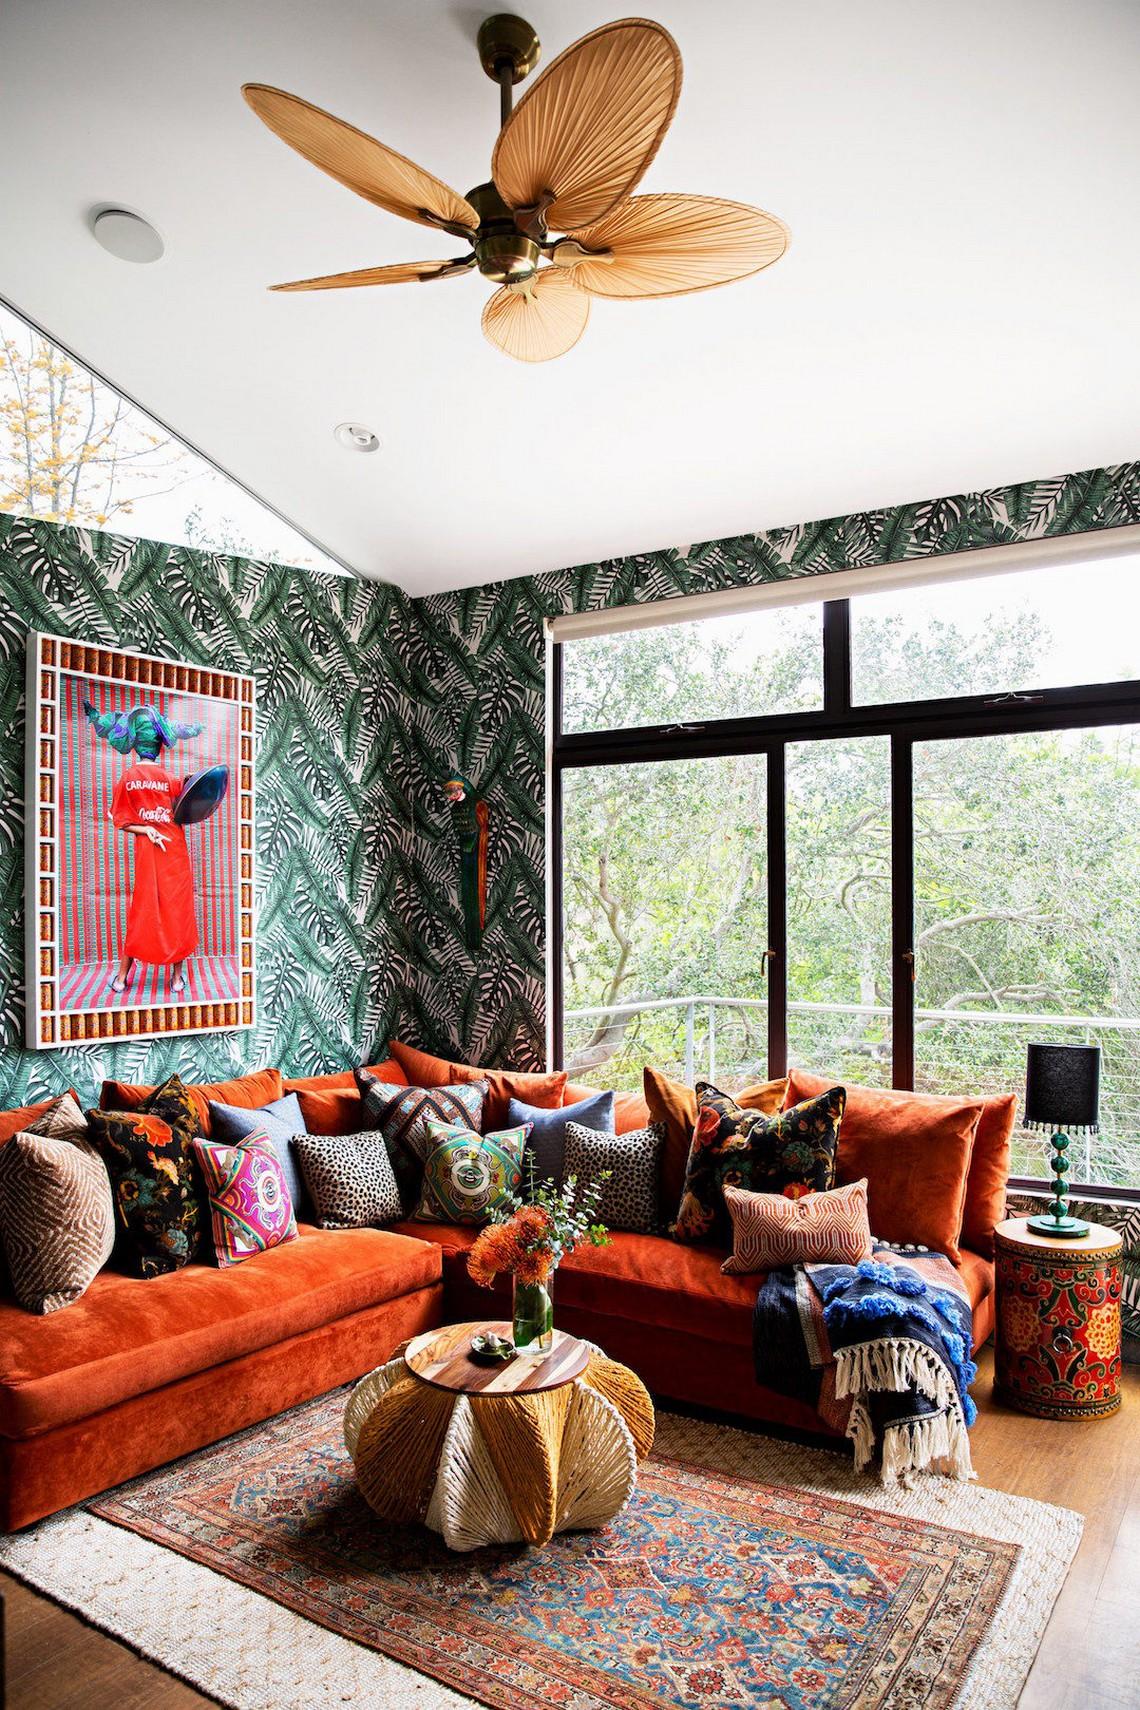 Autumn Design Trends For Inspiring Fresh Ambiances (Part II)